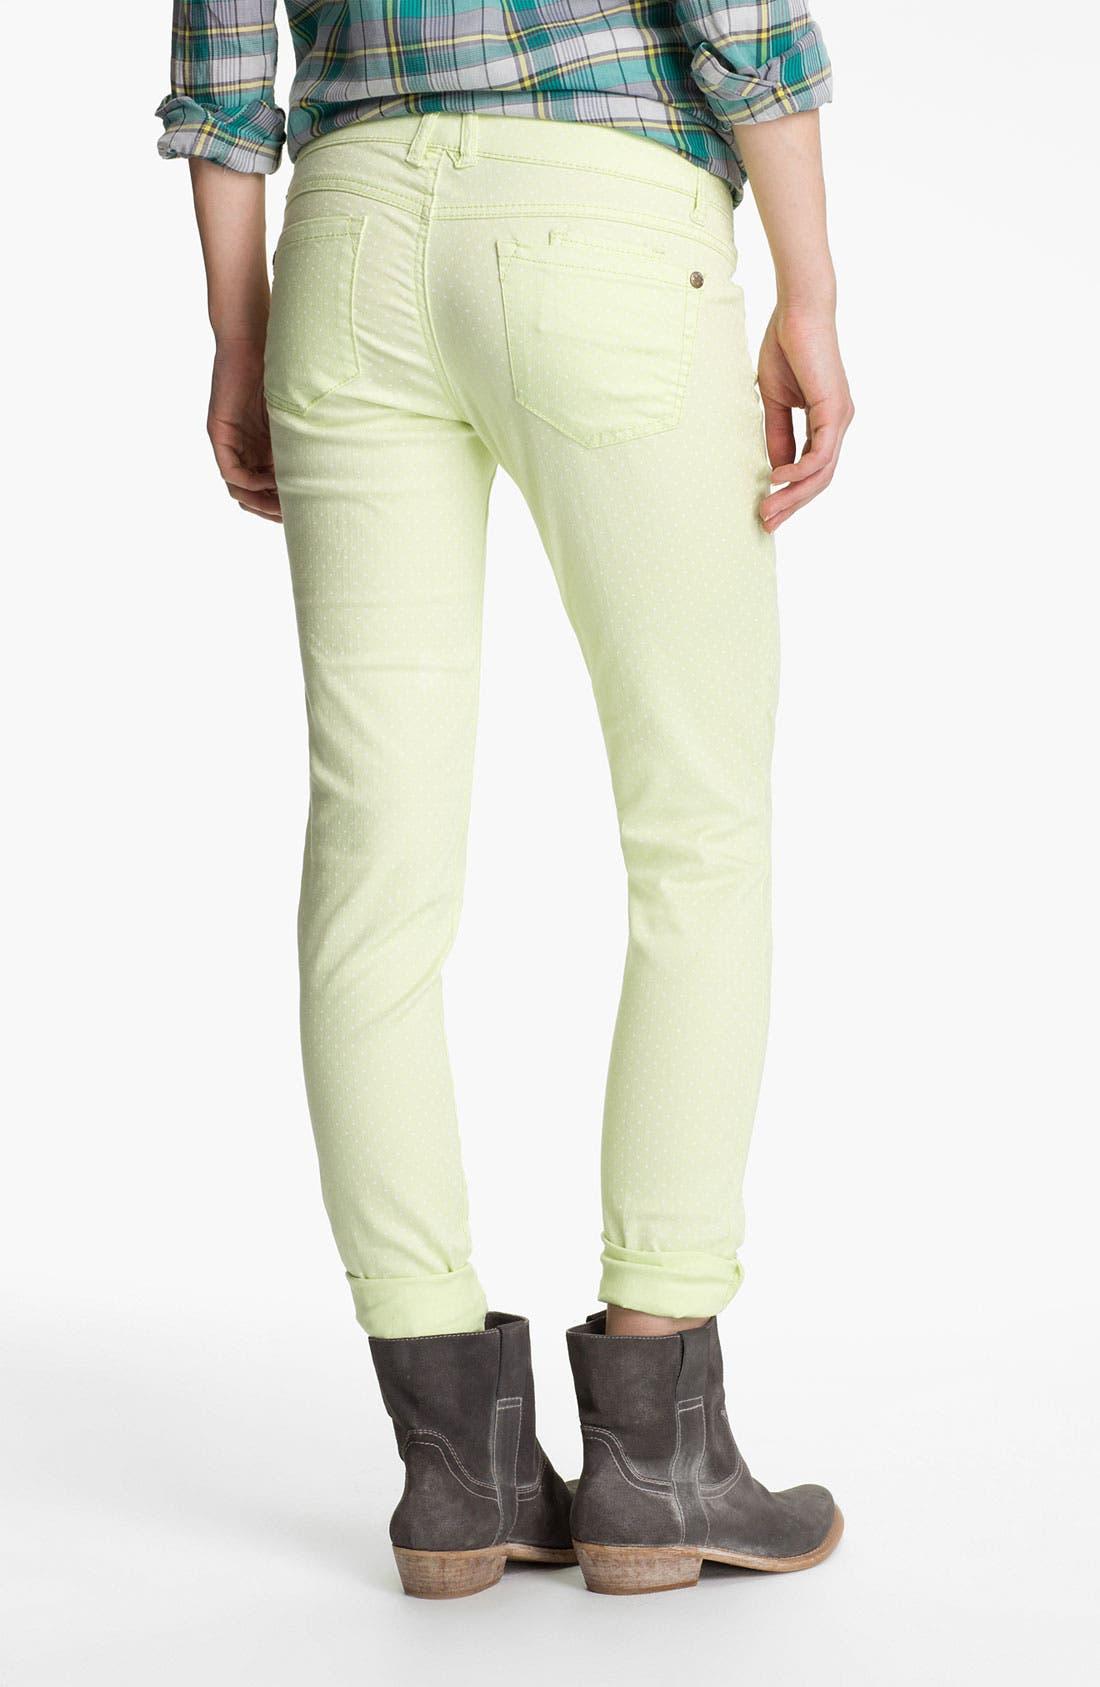 Alternate Image 1 Selected - Jolt Polka Dot Skinny Jeans (Juniors)